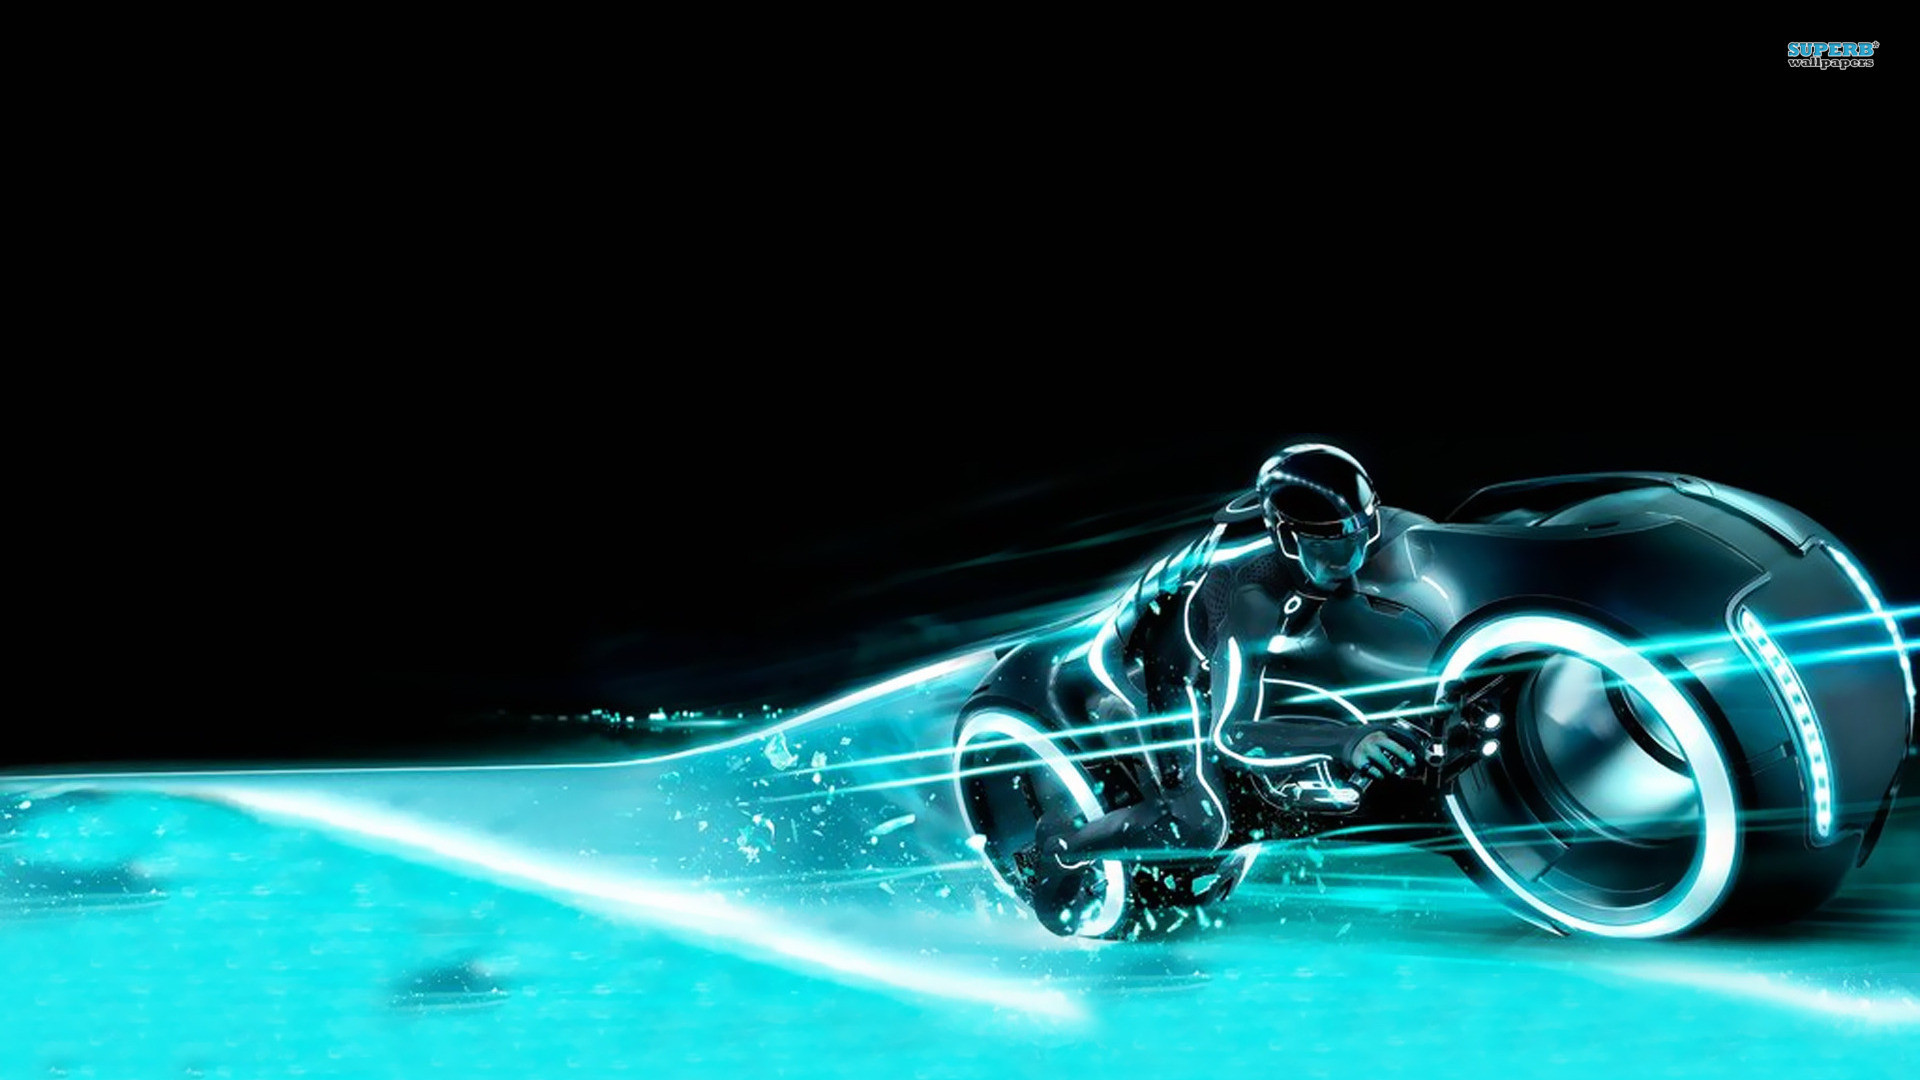 1920x1080 Hd Pics Photos Cars Tron Legacy Light Desktop Background Wallpaper